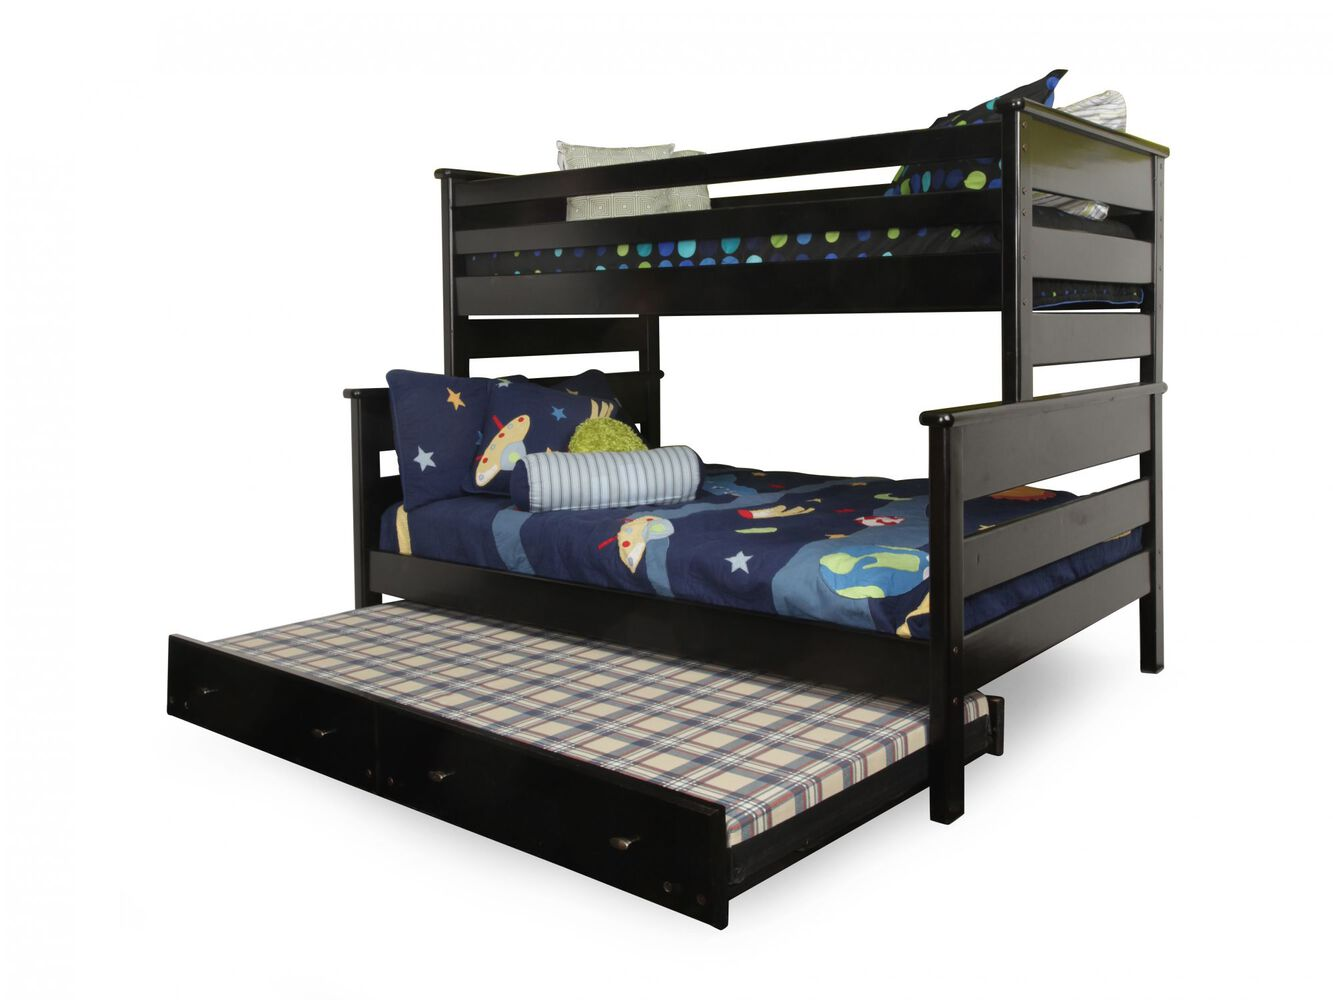 Trendwood Laguna Black Cherry Twin Over Full Bunk Bed With